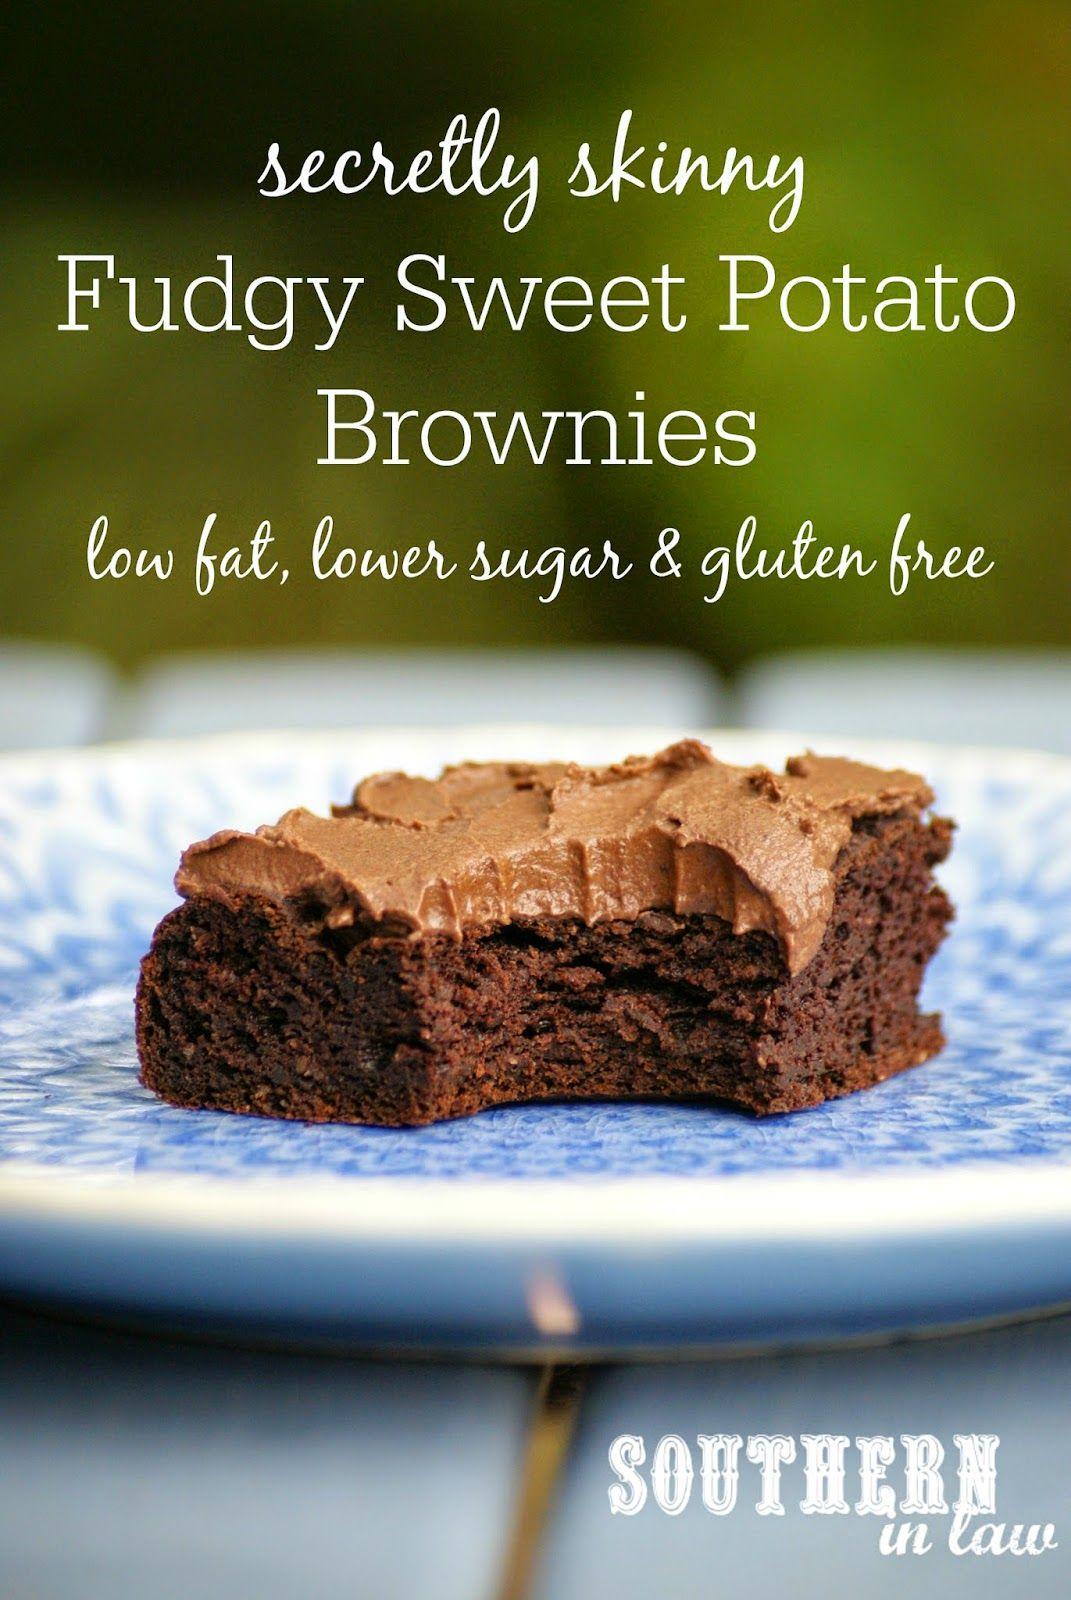 Recipe: Secretly Skinny Fudgy Sweet Potato Brownies ...